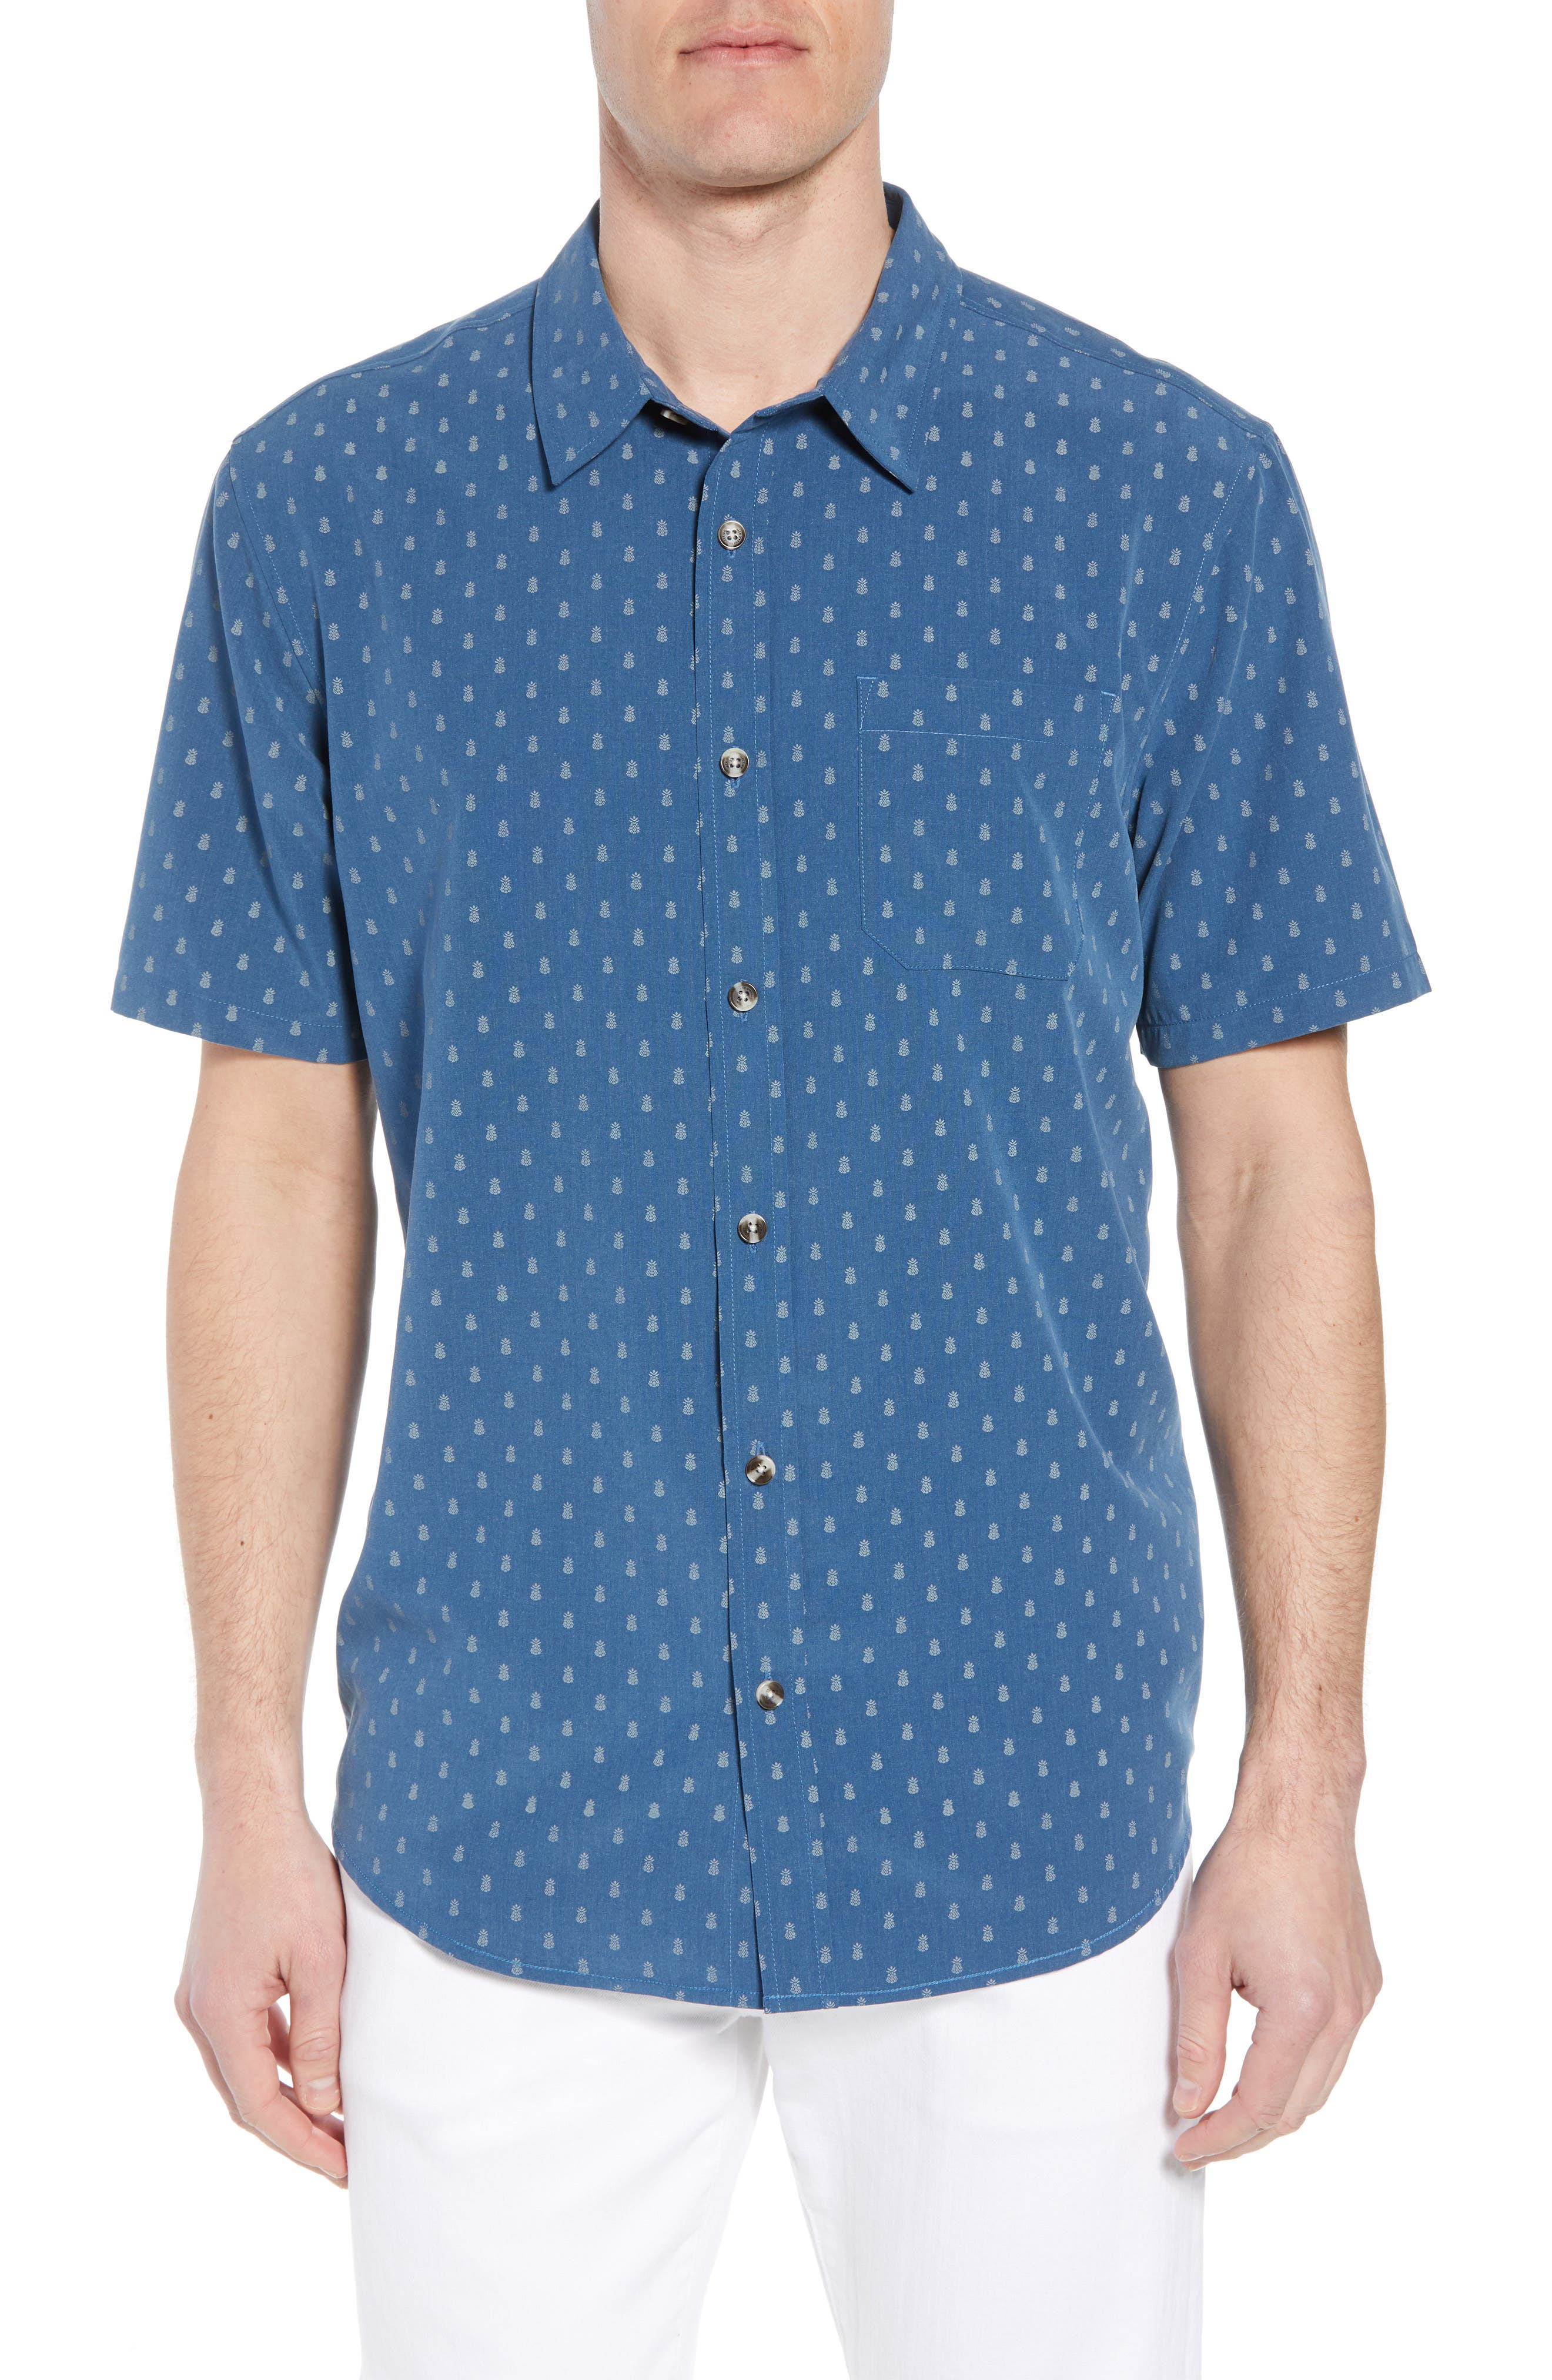 Home Grown Pineapple Sport Shirt, Main, color, COBALT